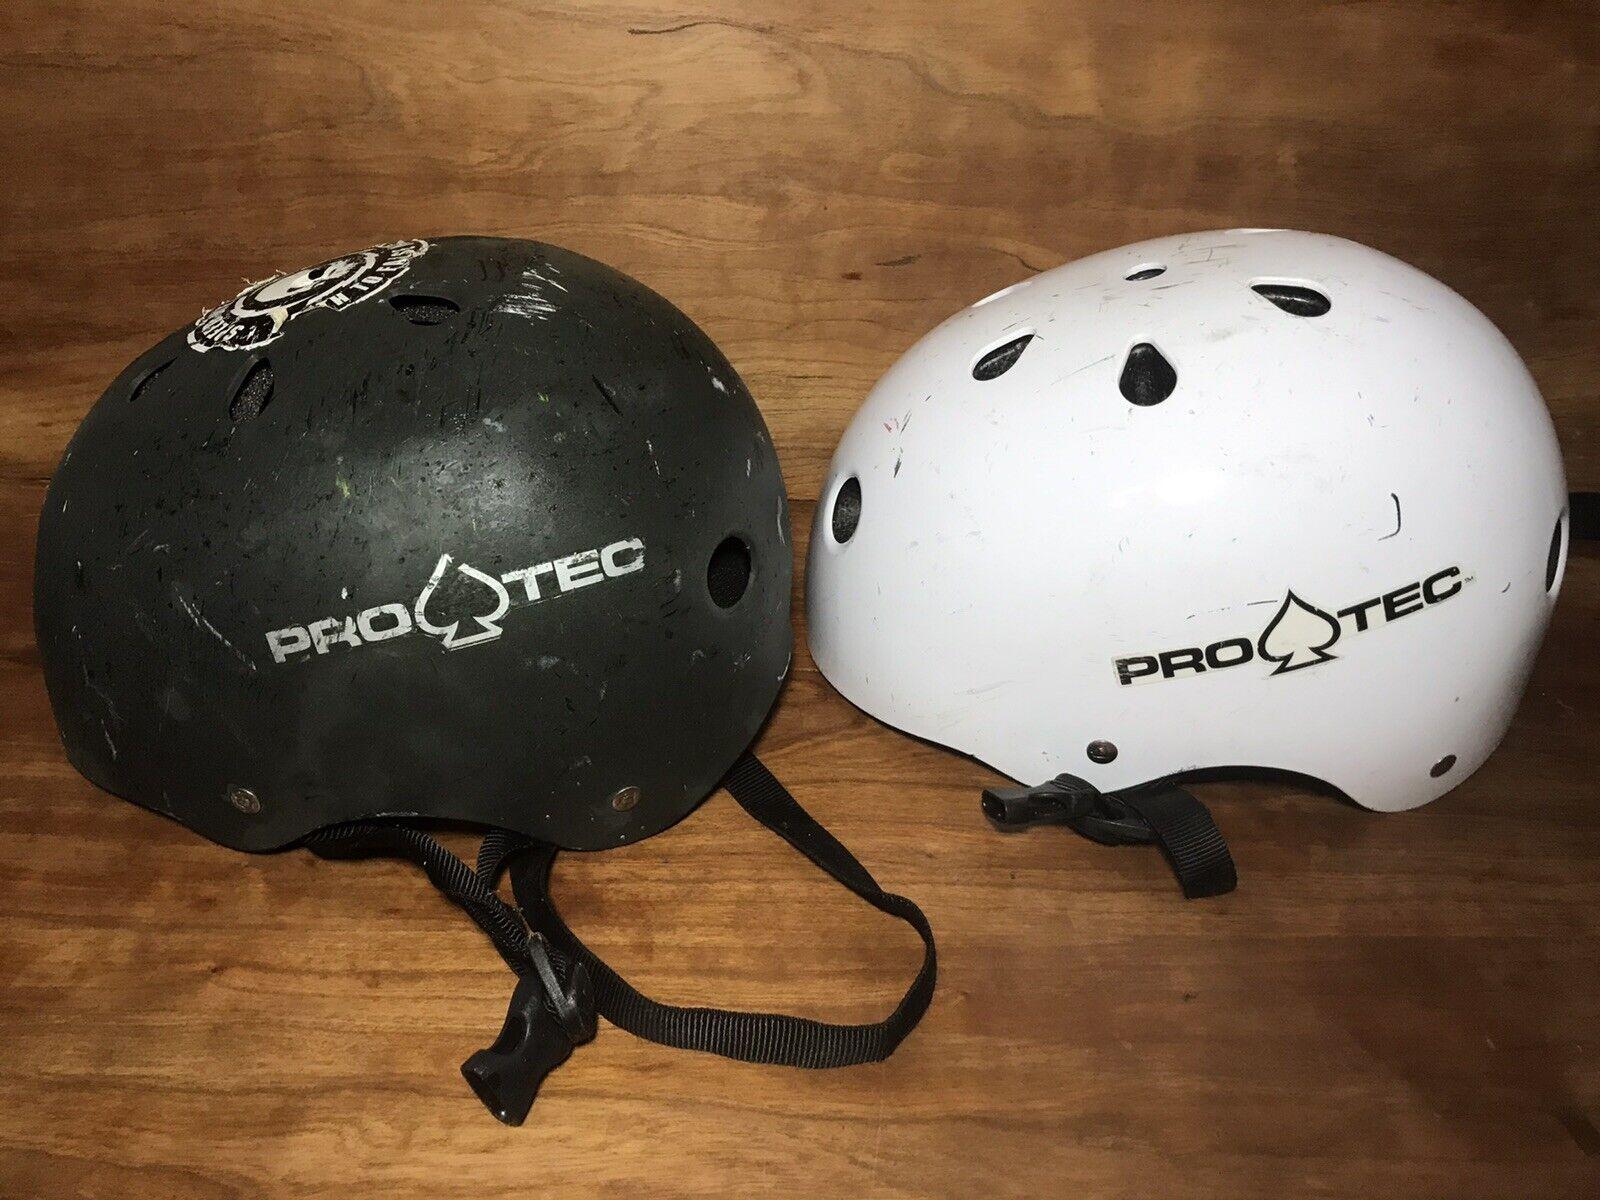 PROPRO Skate Helmet Accessories Bike Skateboard